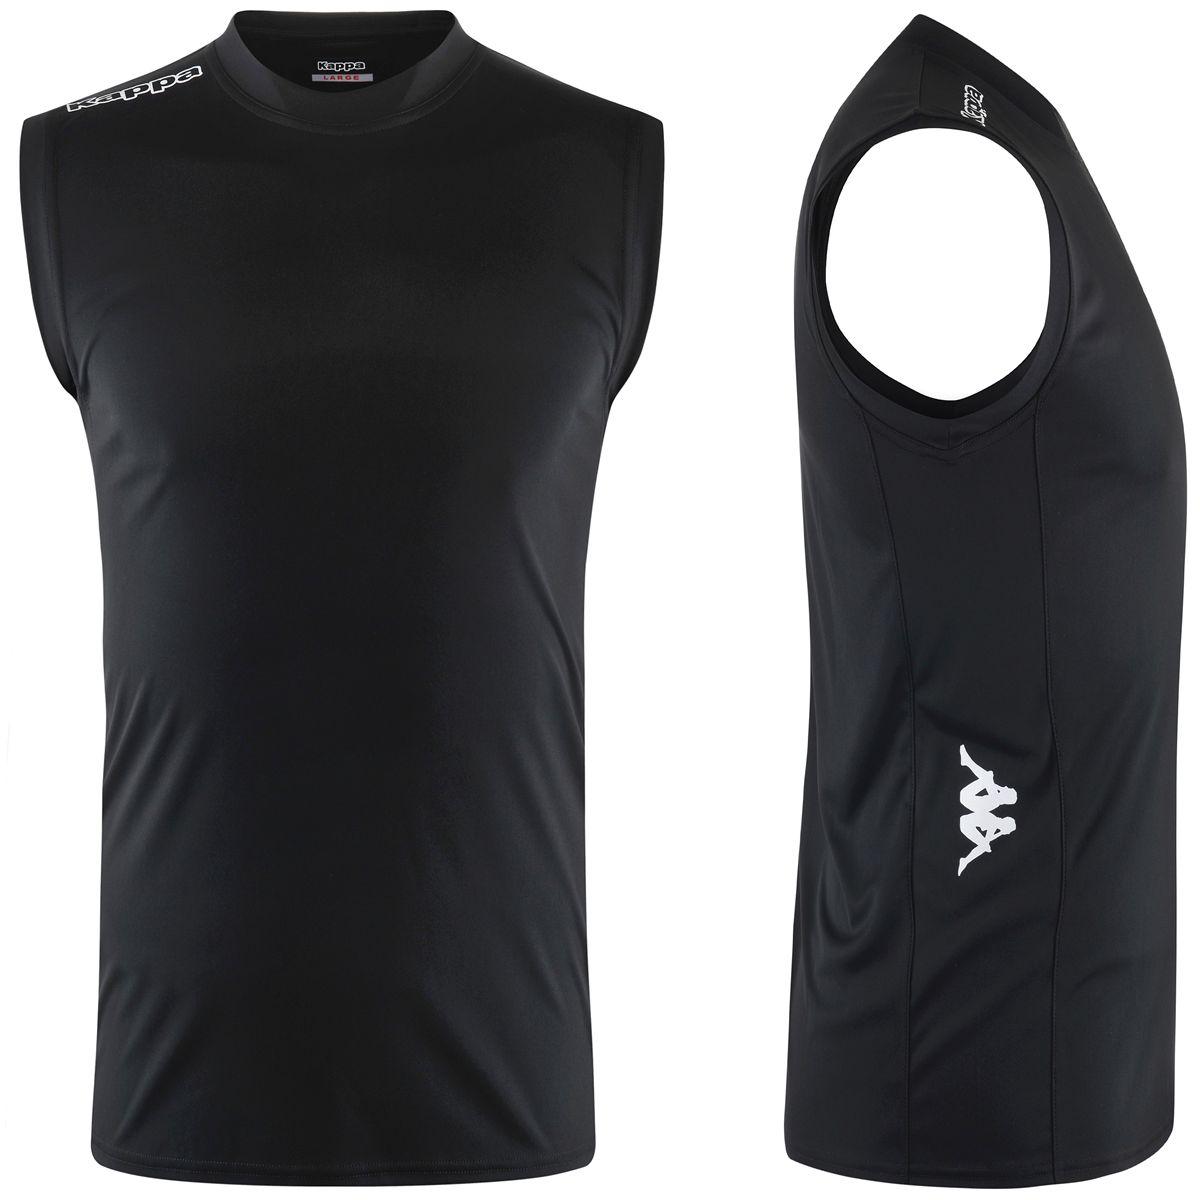 Kappa T-shirt sport Active Jersey KAPPA4VOLLEY ASTON Junior Boy Tank